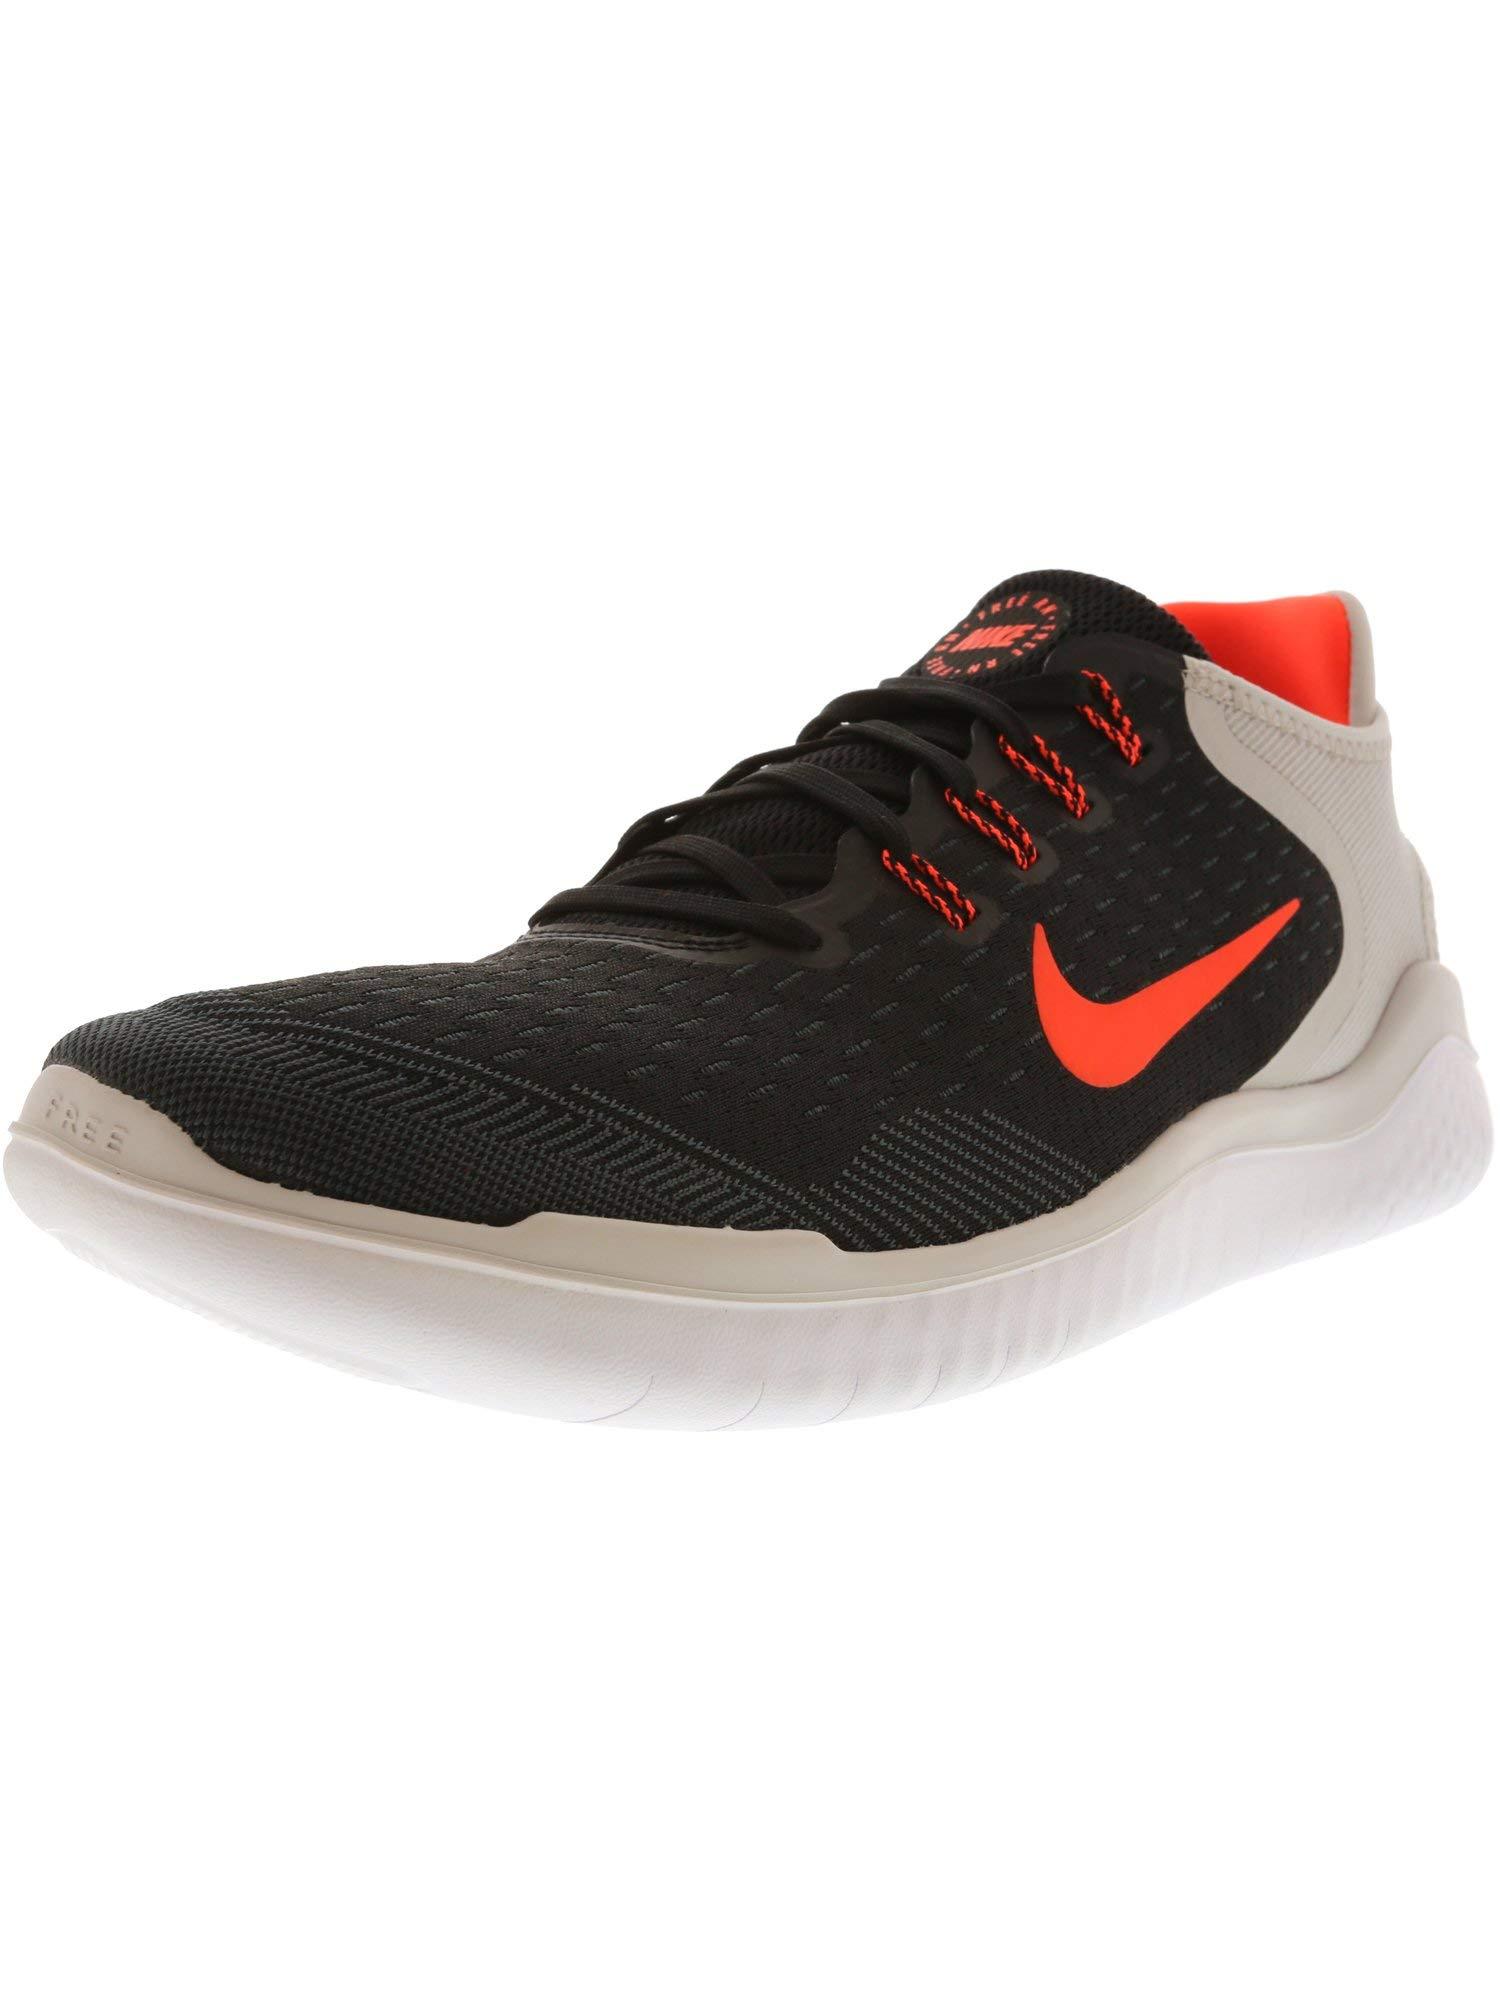 separation shoes d6e4d b0ae4 Nike Men s Free RN 2018 Black Total Crimson-Vast Grey-White Running Shoes  (9 D(M) US)